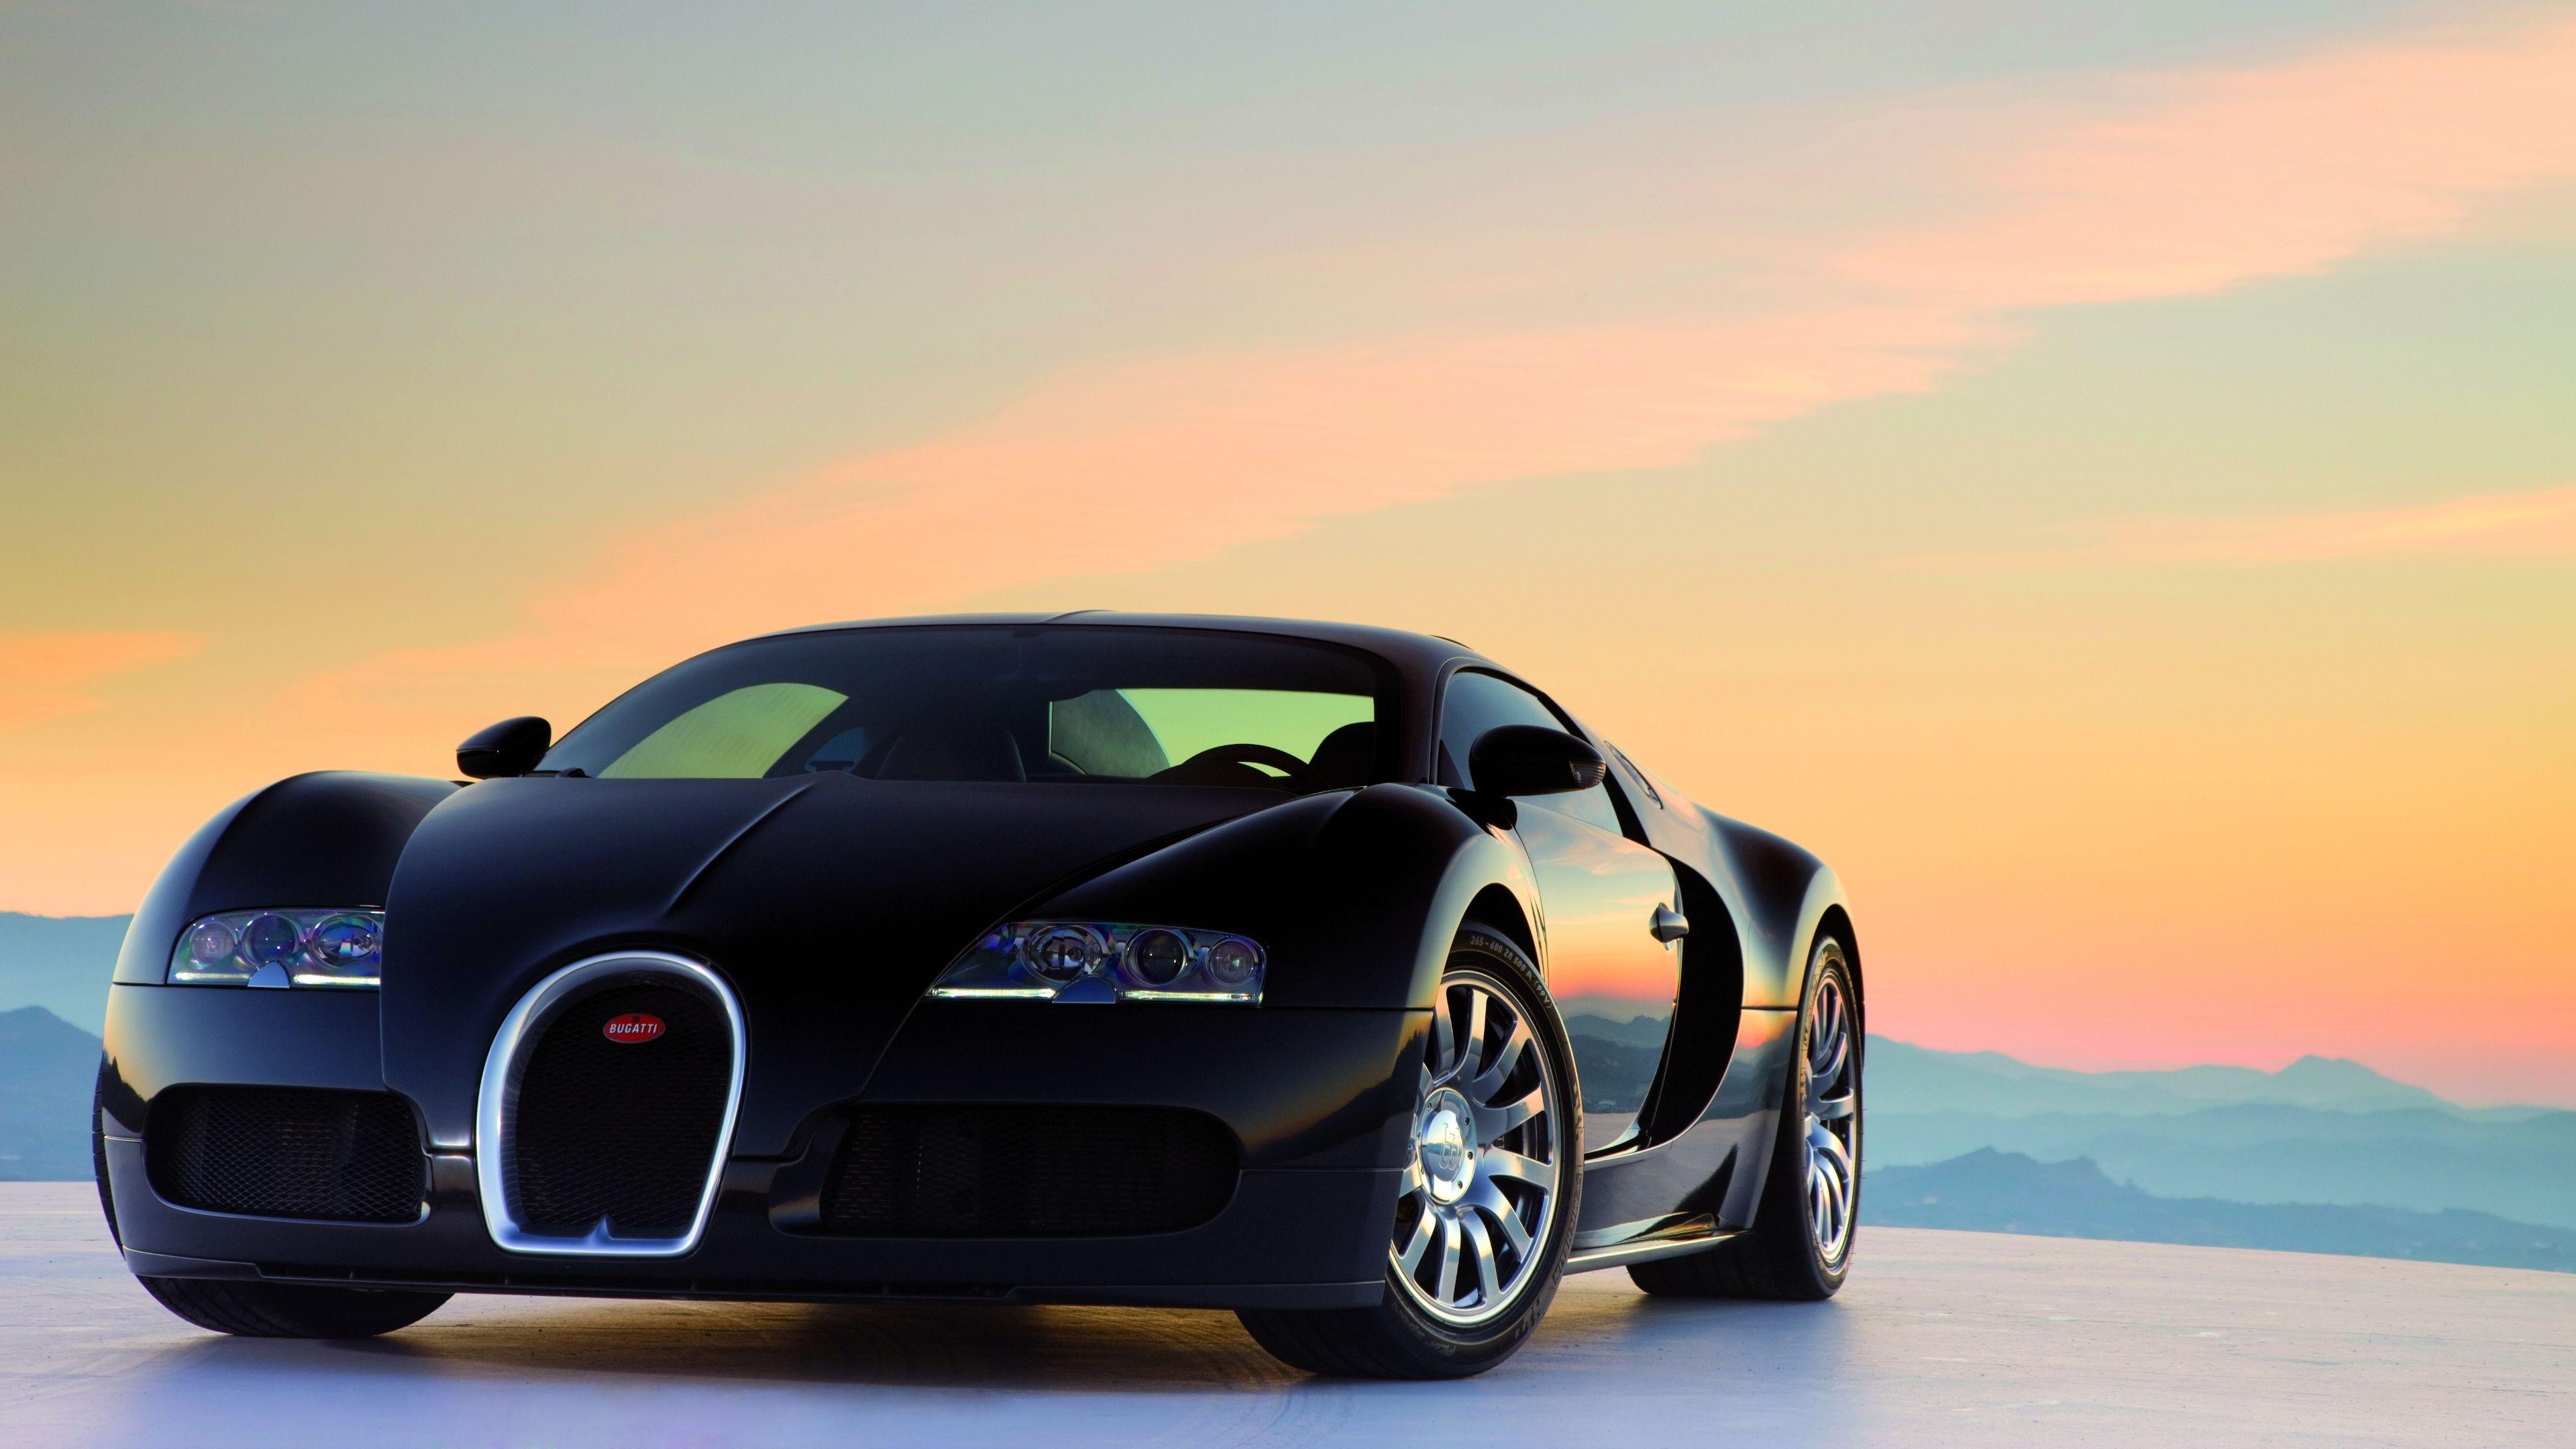 Bugatti Veyron Poster Bugatti Veyron Wallpapers Bugatti Veyron Bugatti